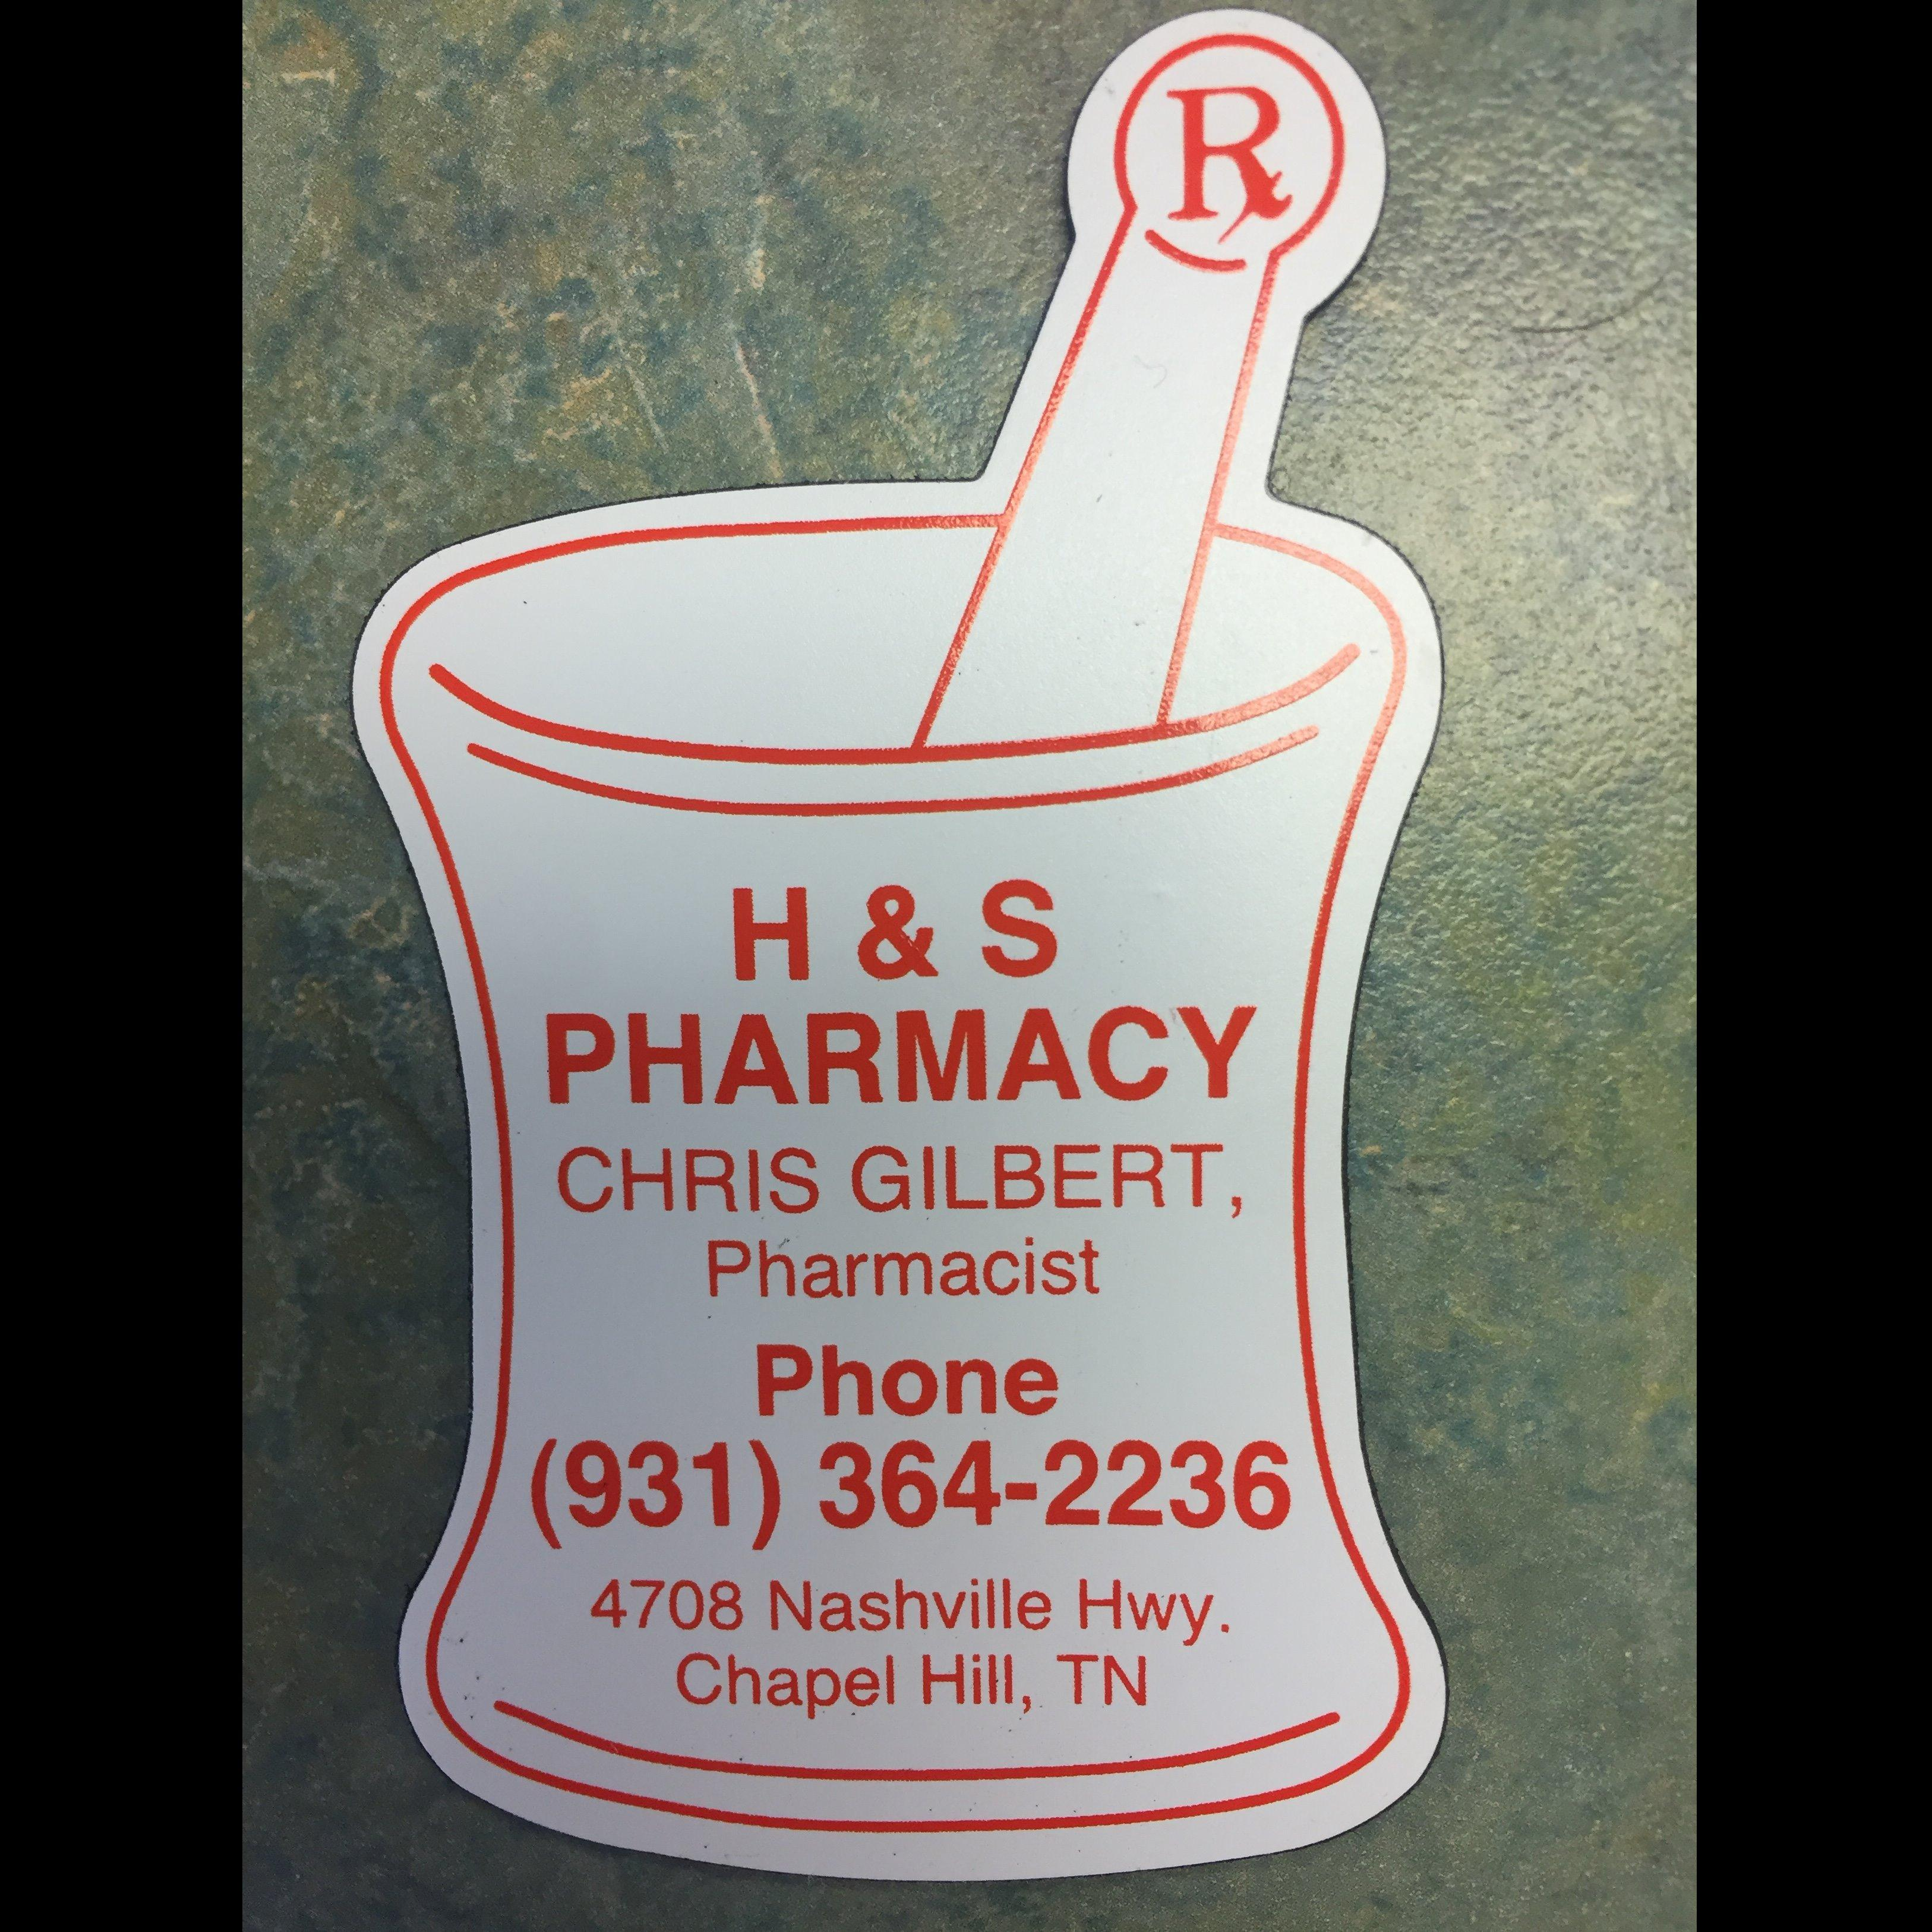 H & S Pharmacy of Chapel Hill